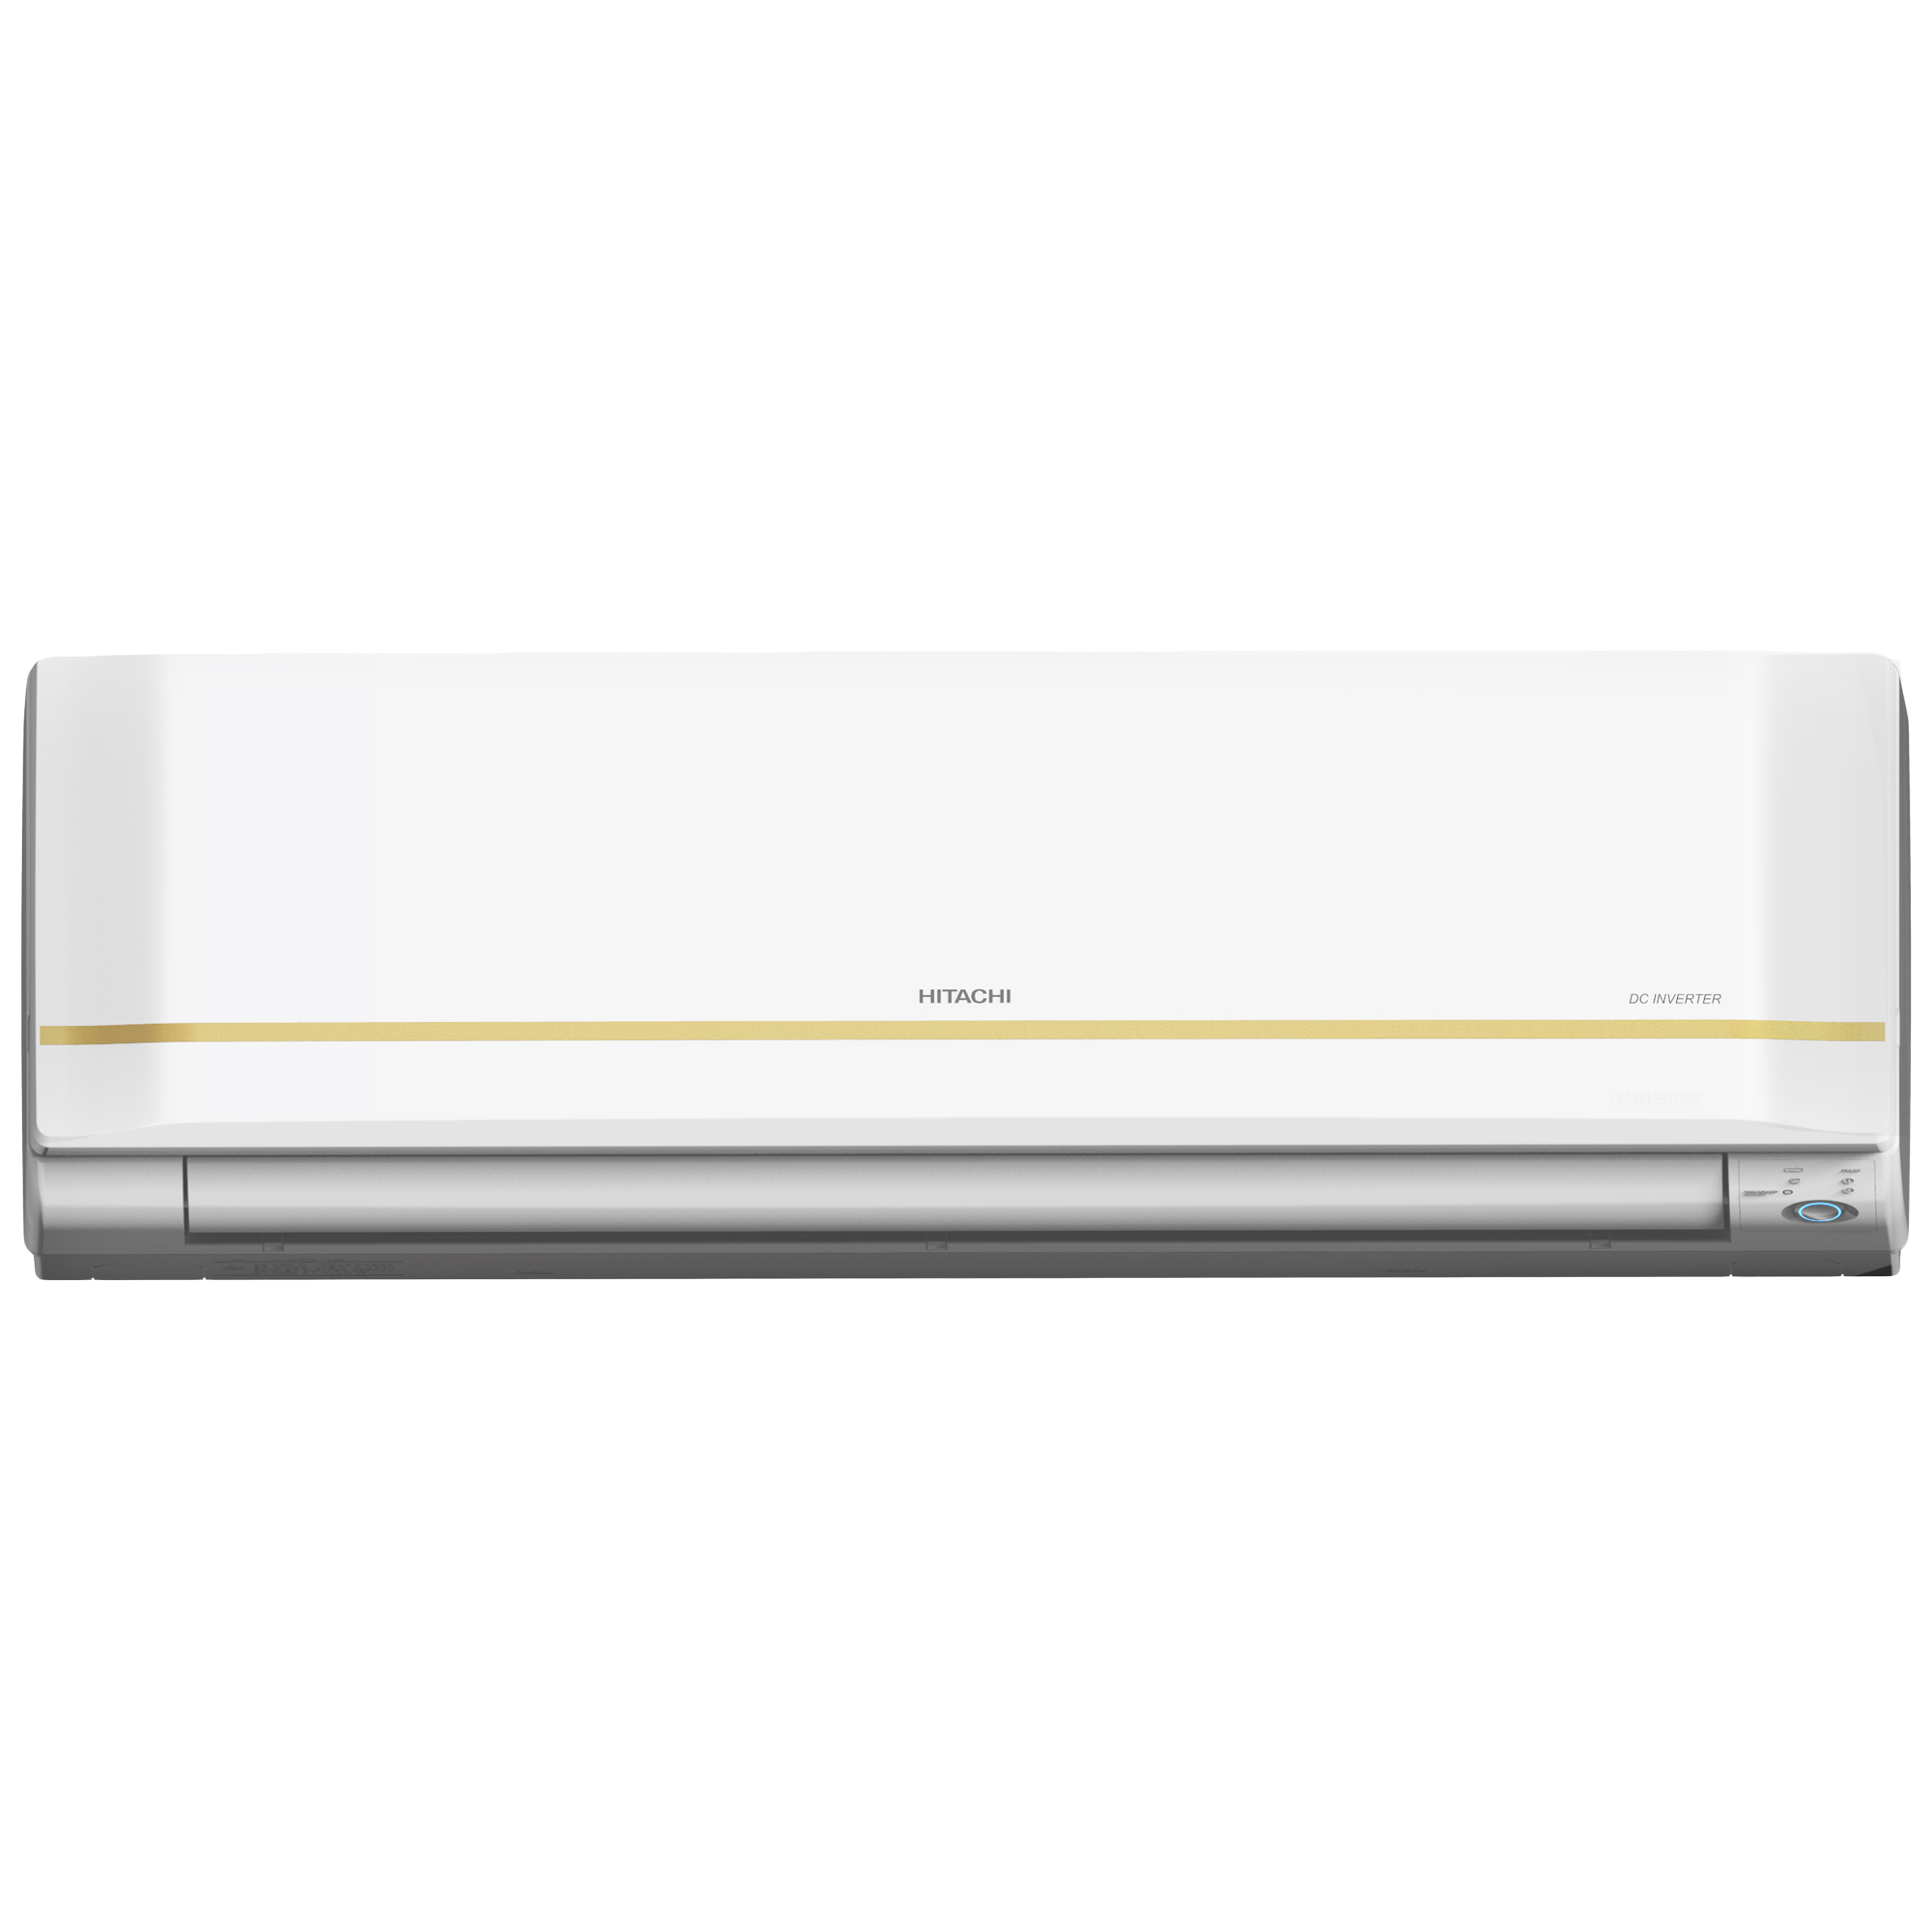 Hitachi Kiyora 5300X I-Clean 1.5 Ton 5 Star Inverter Split AC (Copper Condenser, RSRG518IEEA, White)_1